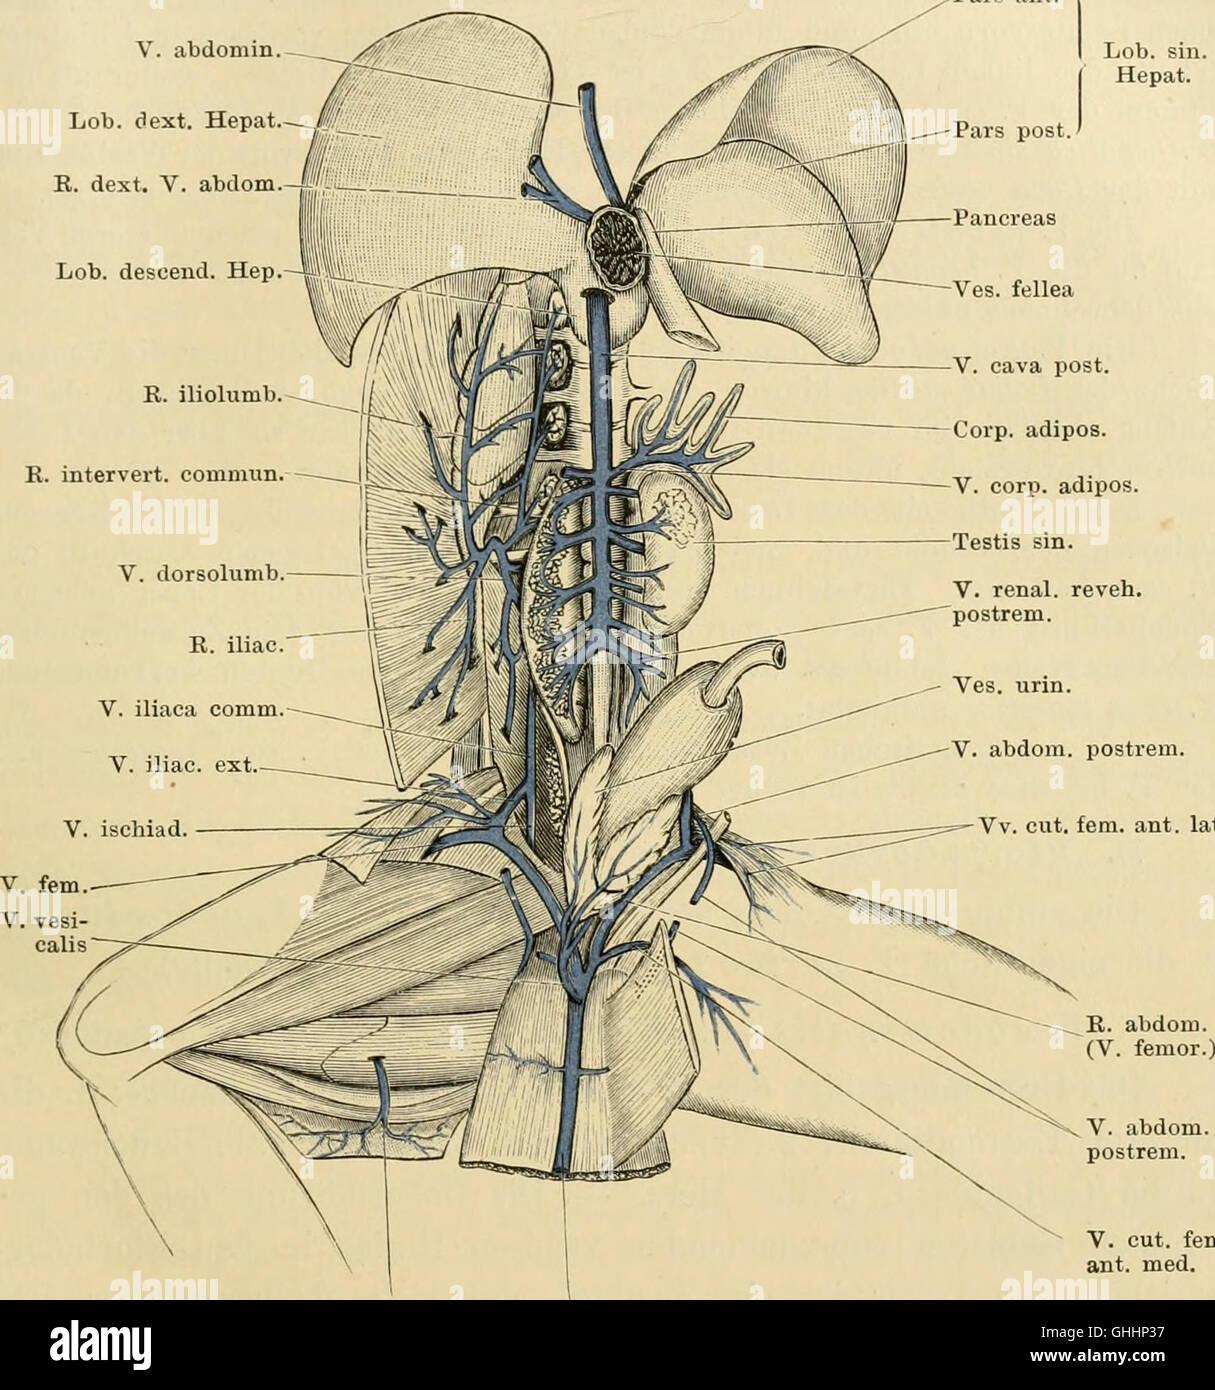 Großzügig Ant Anatomie Diagramm Fotos - Anatomie Und Physiologie ...